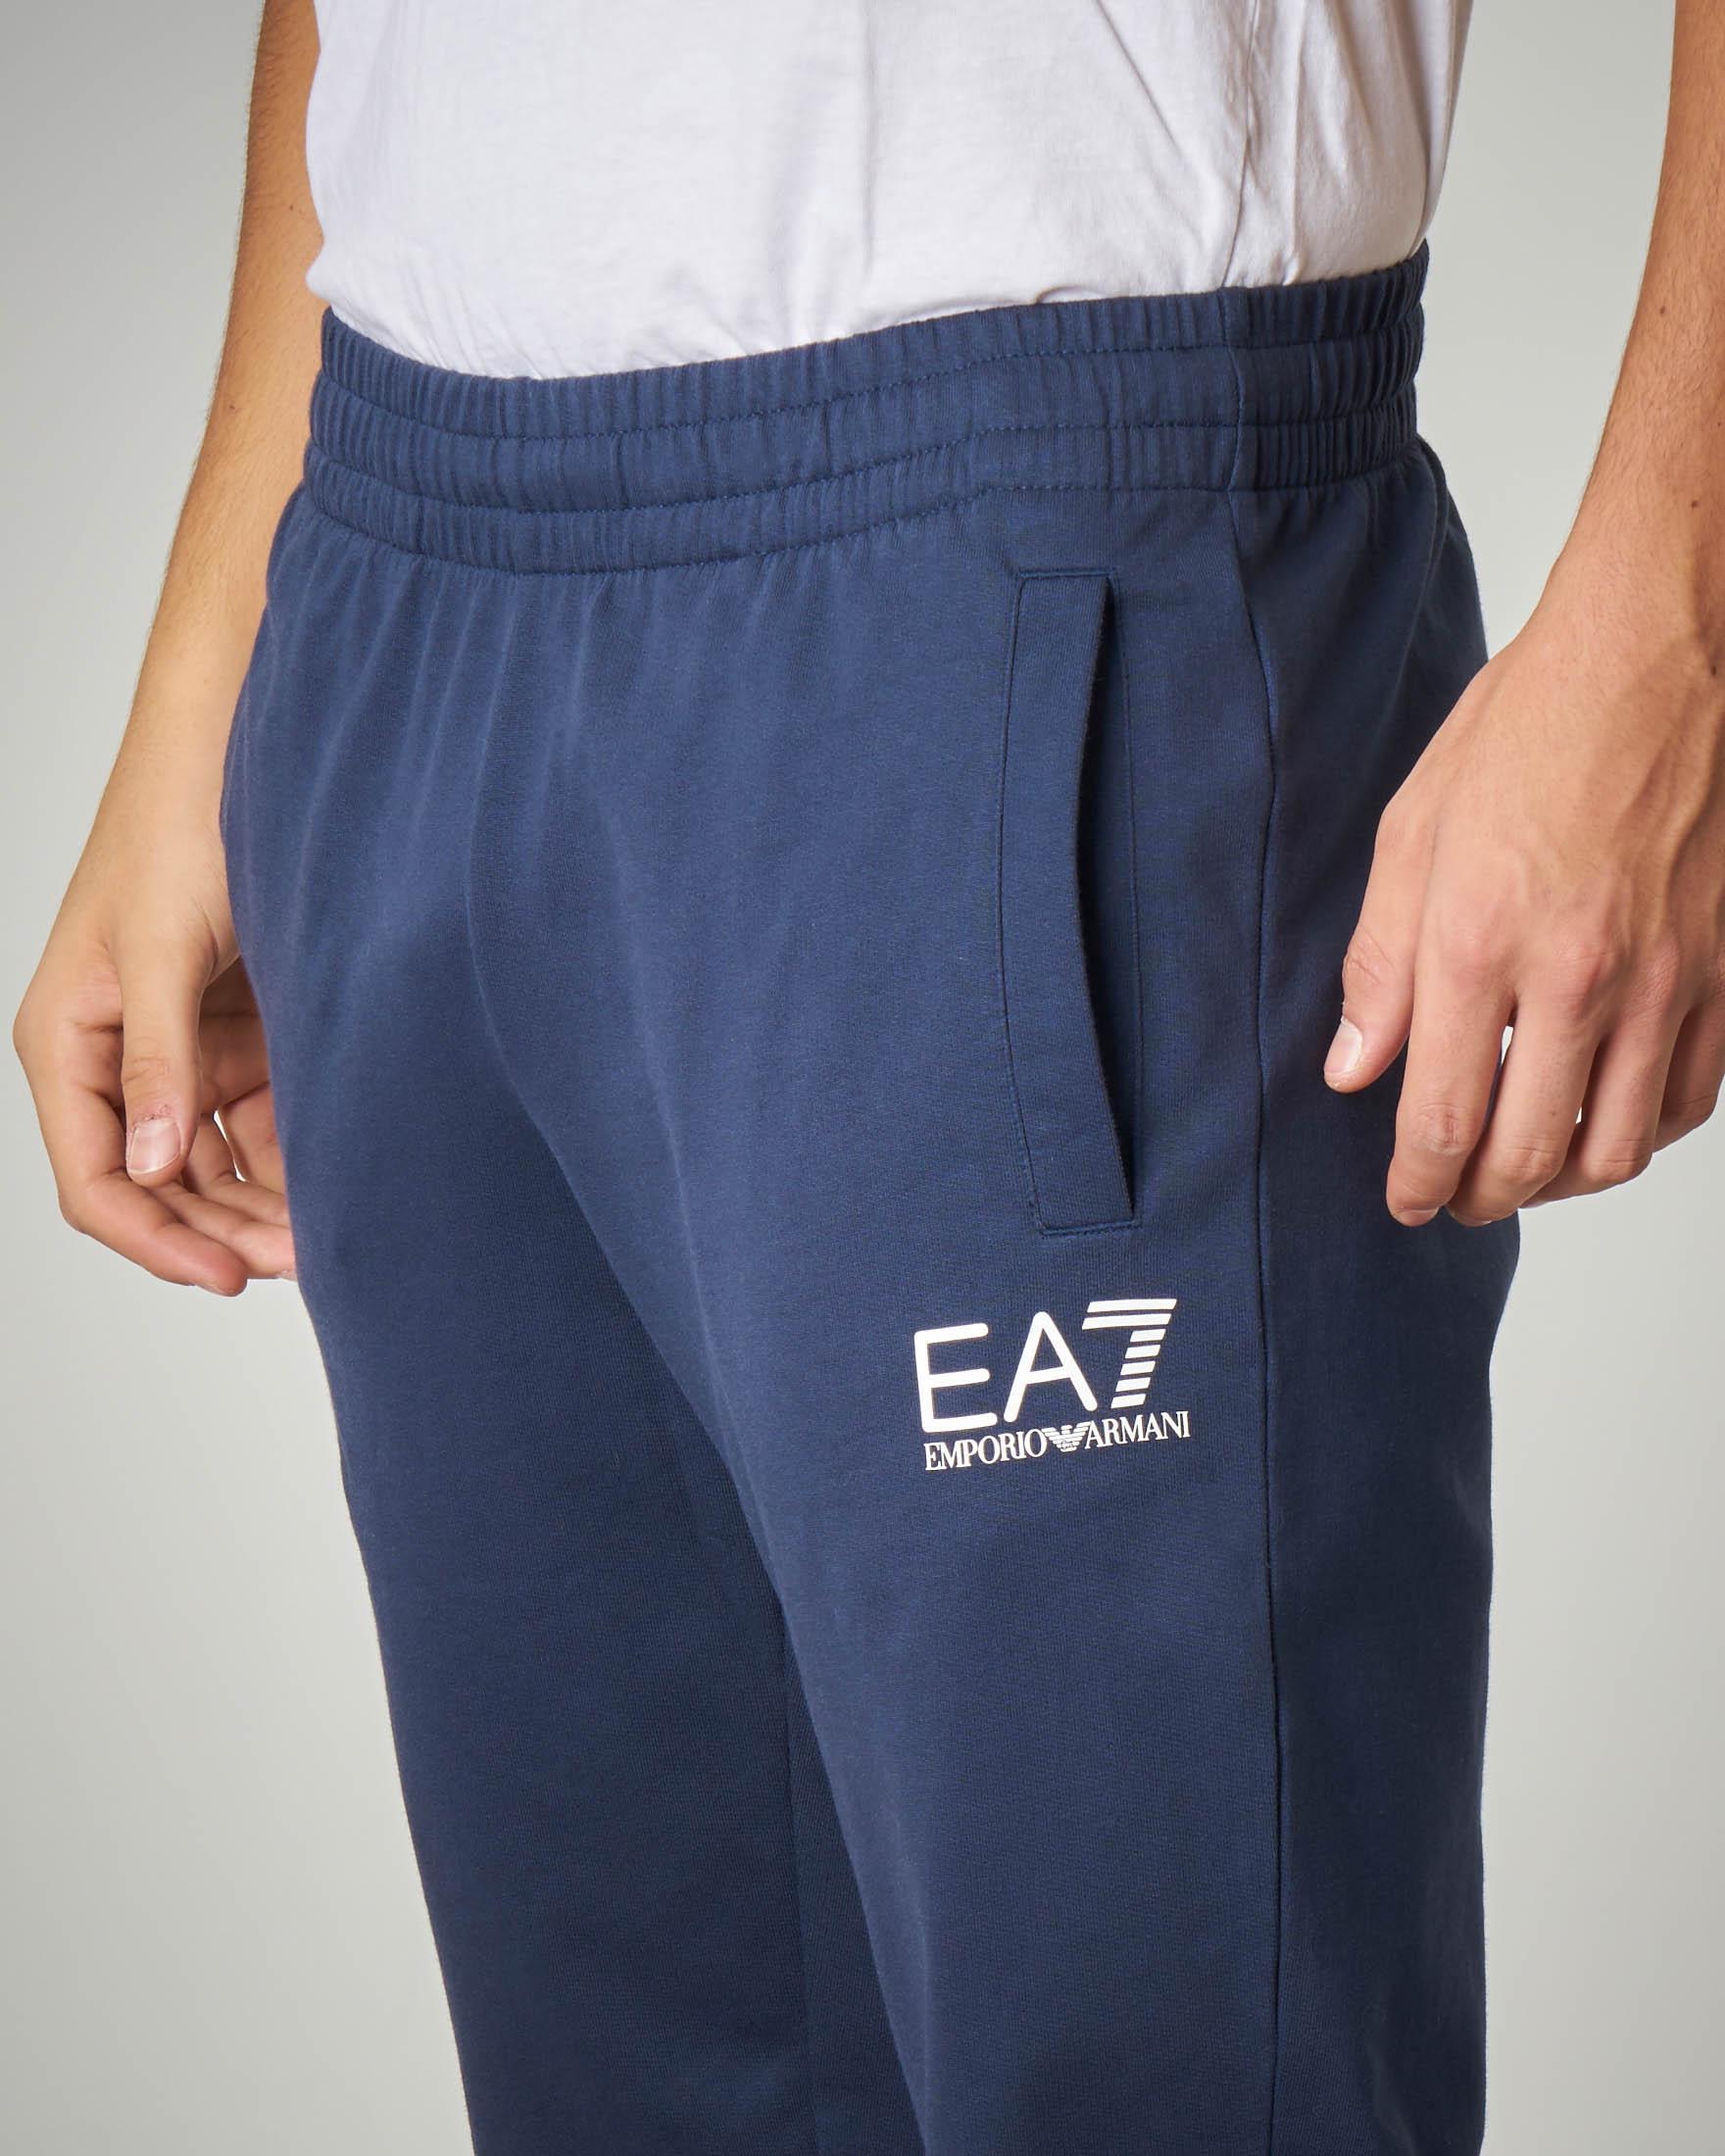 Pantalone blu in felpa leggera logo piccolo